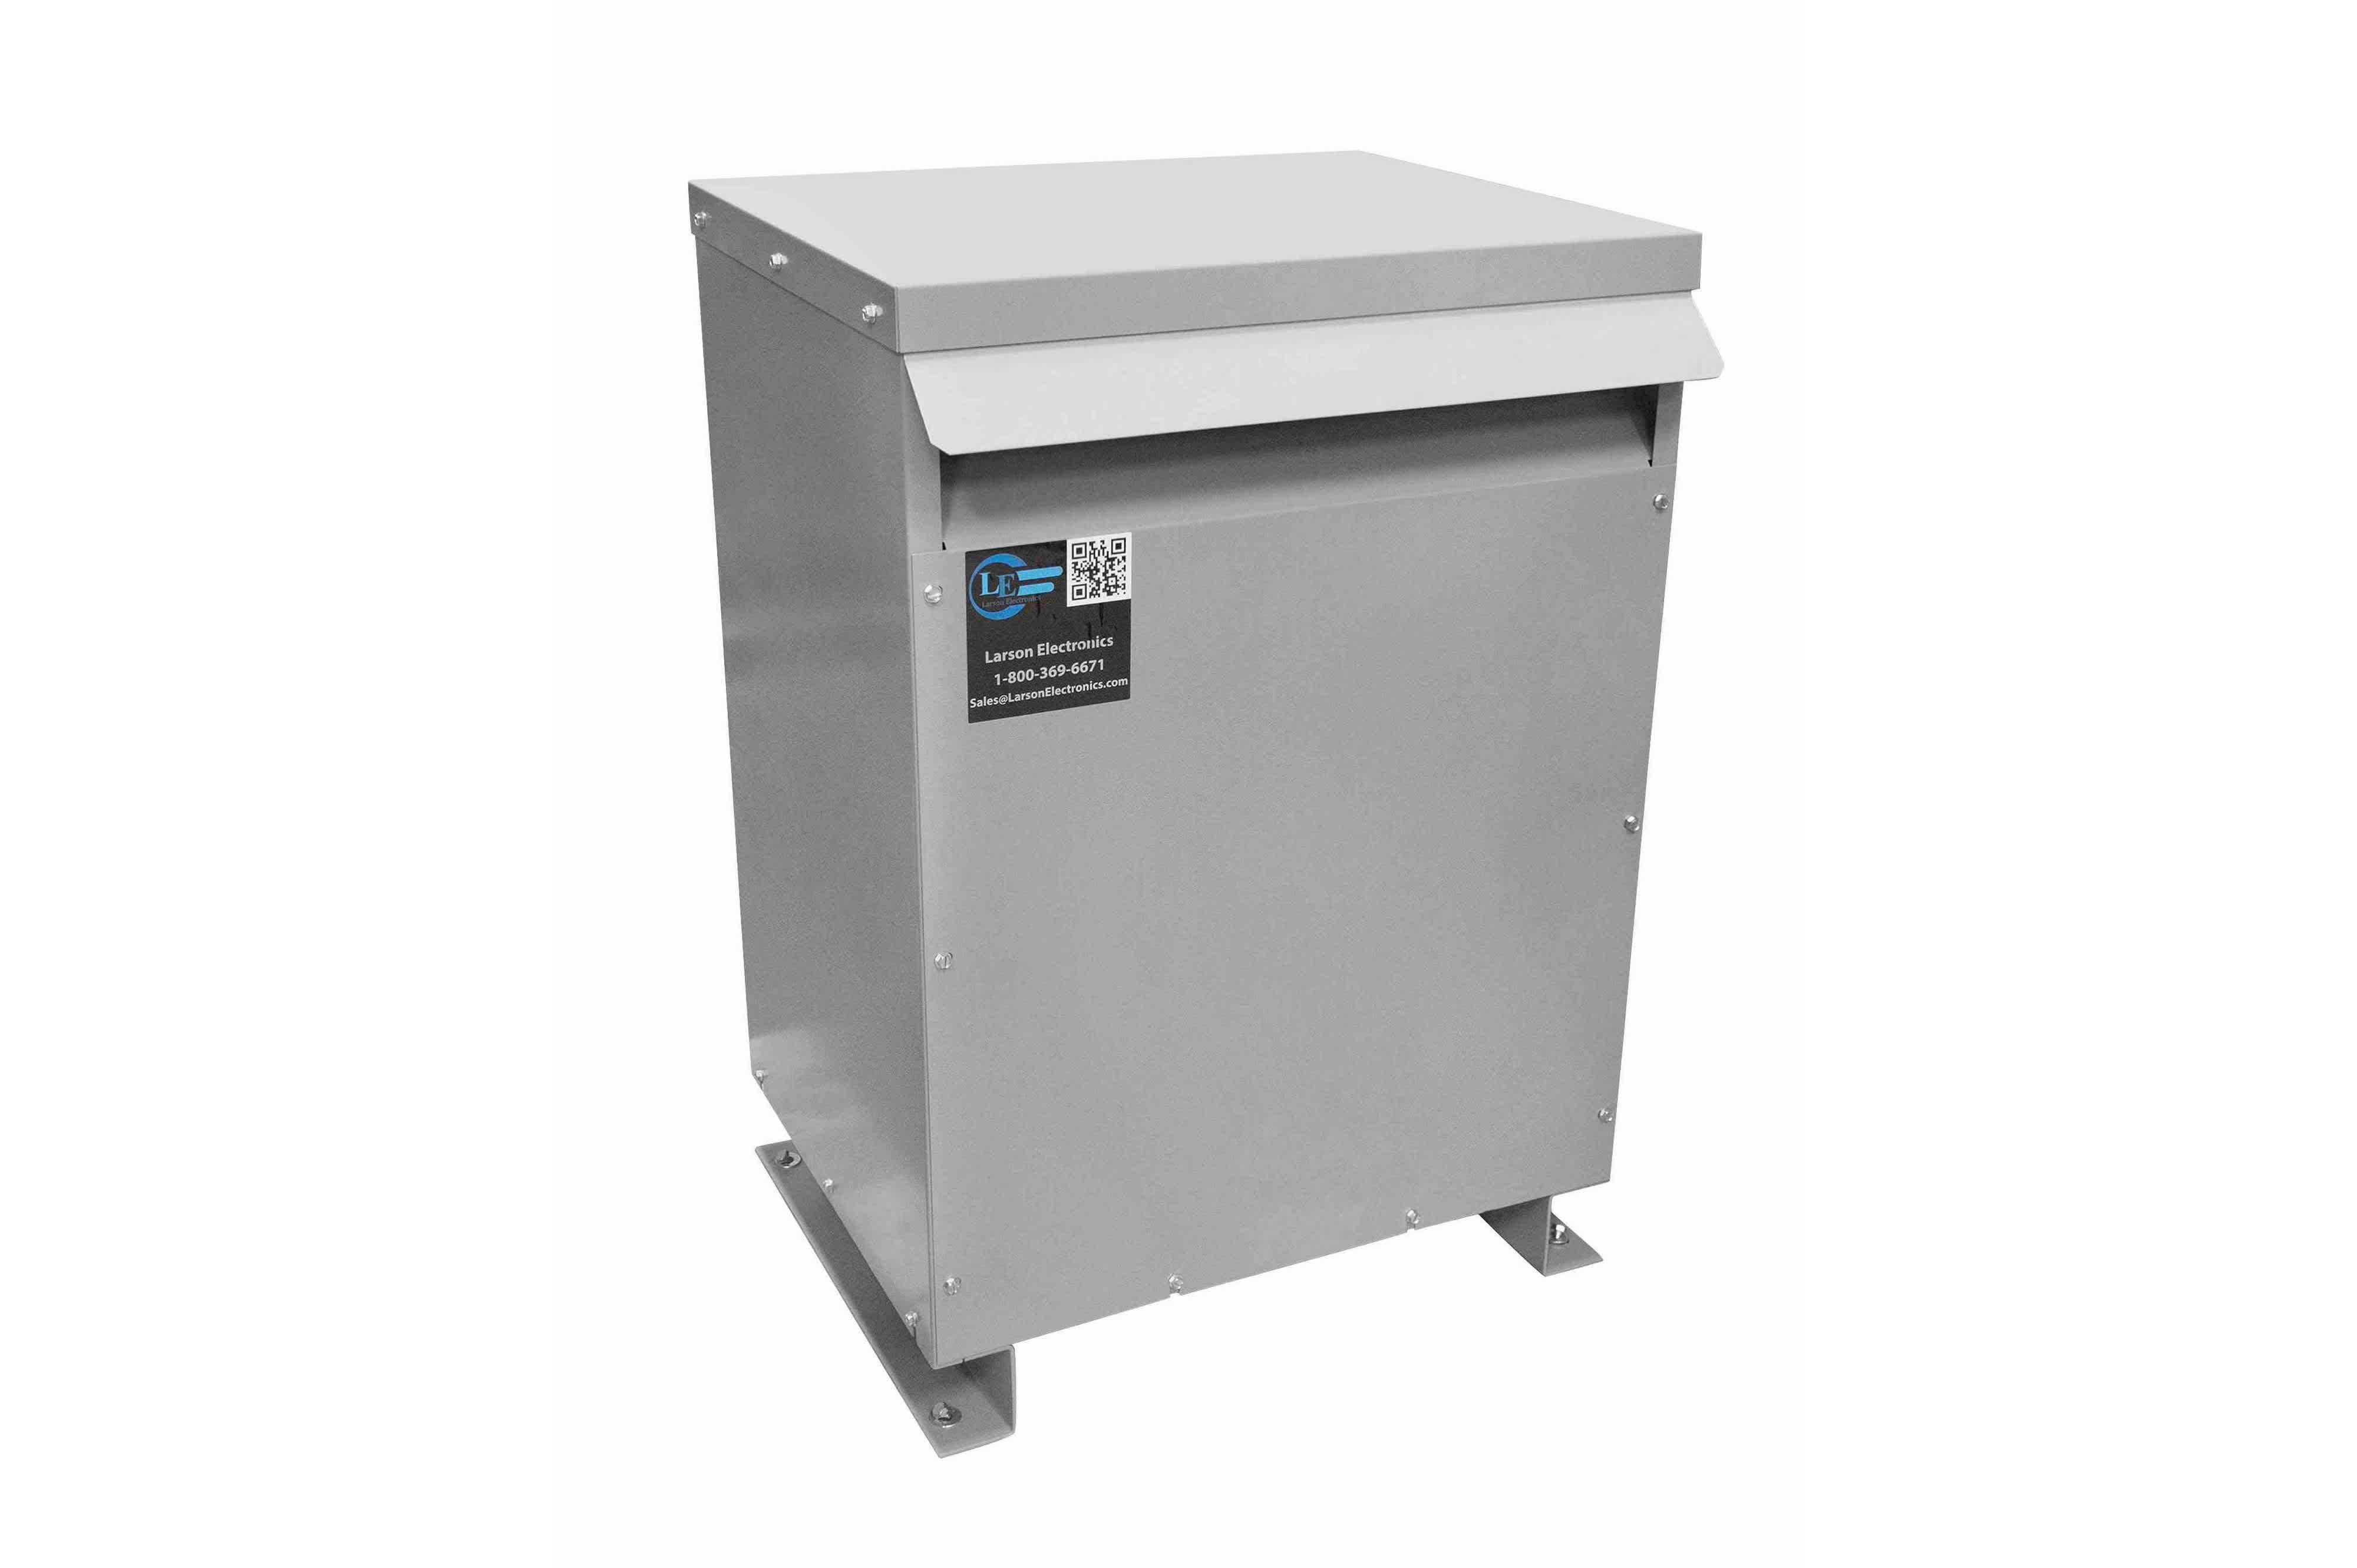 150 kVA 3PH Isolation Transformer, 240V Wye Primary, 480Y/277 Wye-N Secondary, N3R, Ventilated, 60 Hz